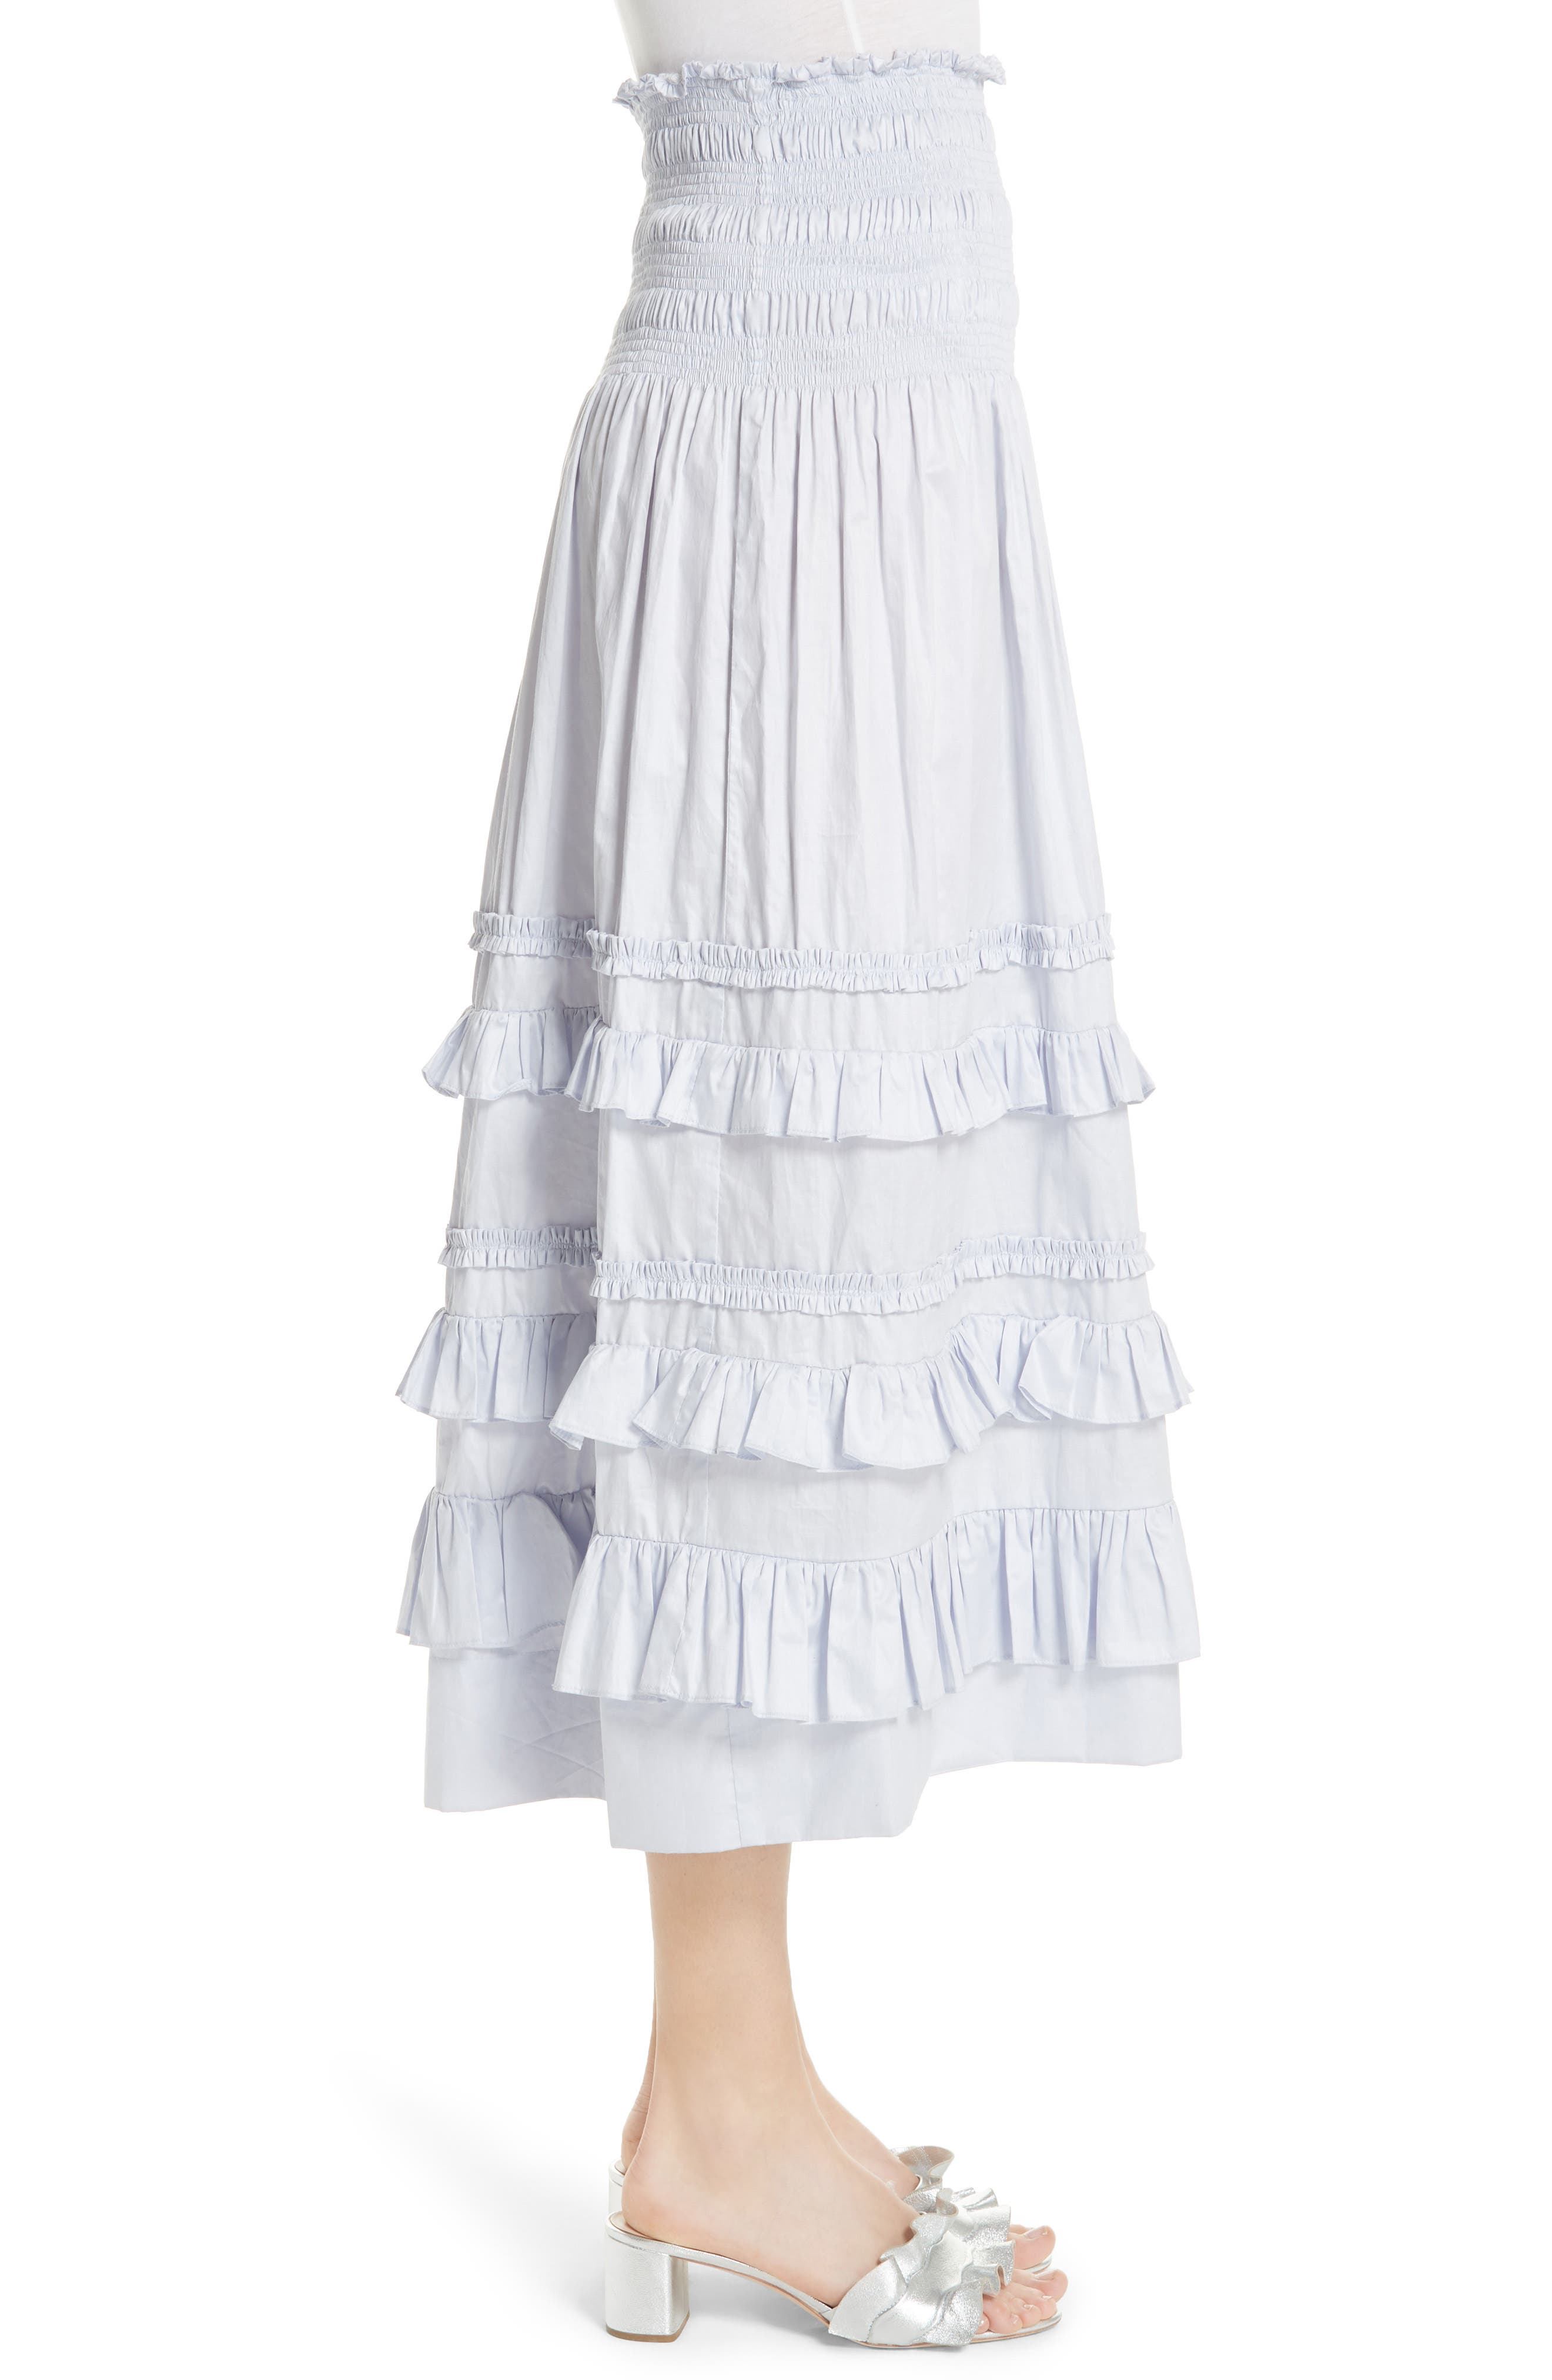 REBECCA TAYLOR, Ruffle Trim Midi Skirt, Alternate thumbnail 3, color, 458